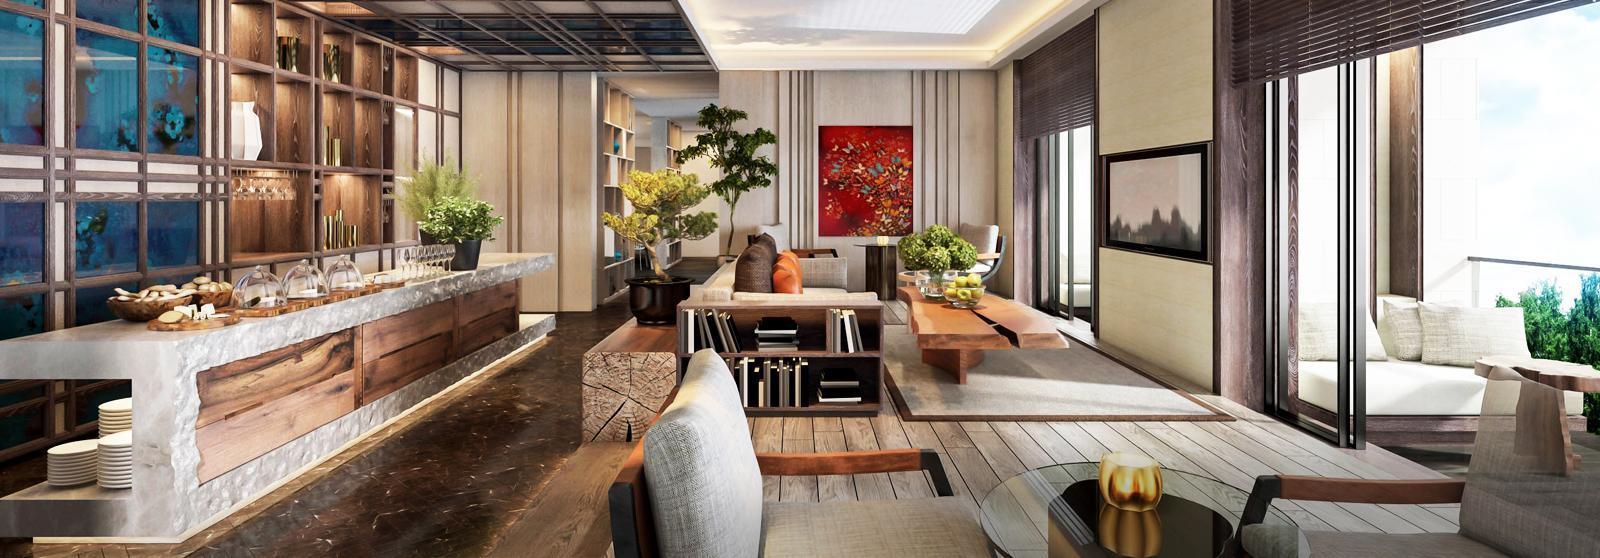 上海阿纳迪酒店(The Anandi Hotel and Spa)【 上海,中国】  酒店  www.lhw.cn